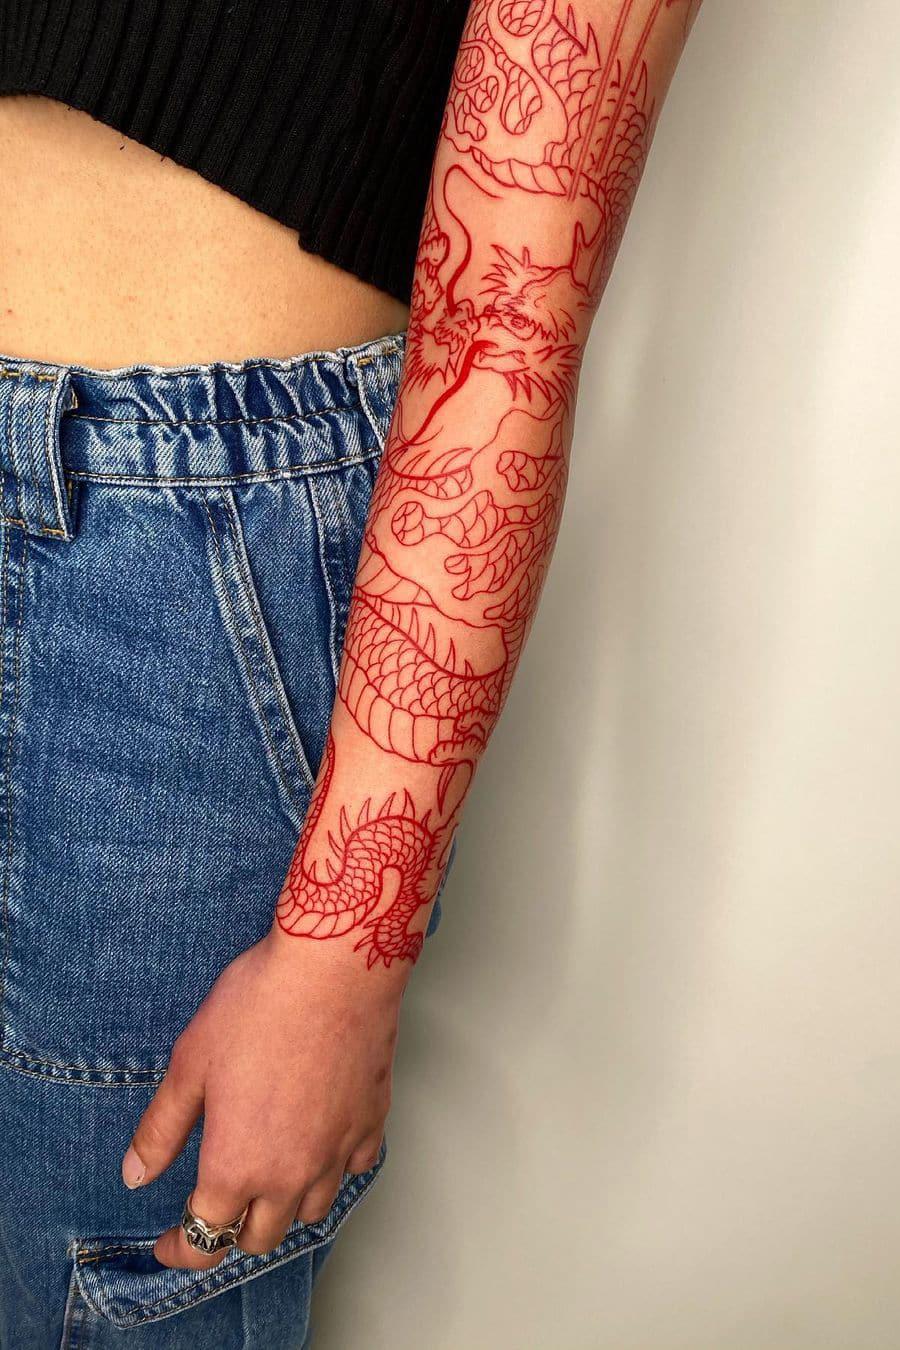 Red Dragon Sleeve Tattoo